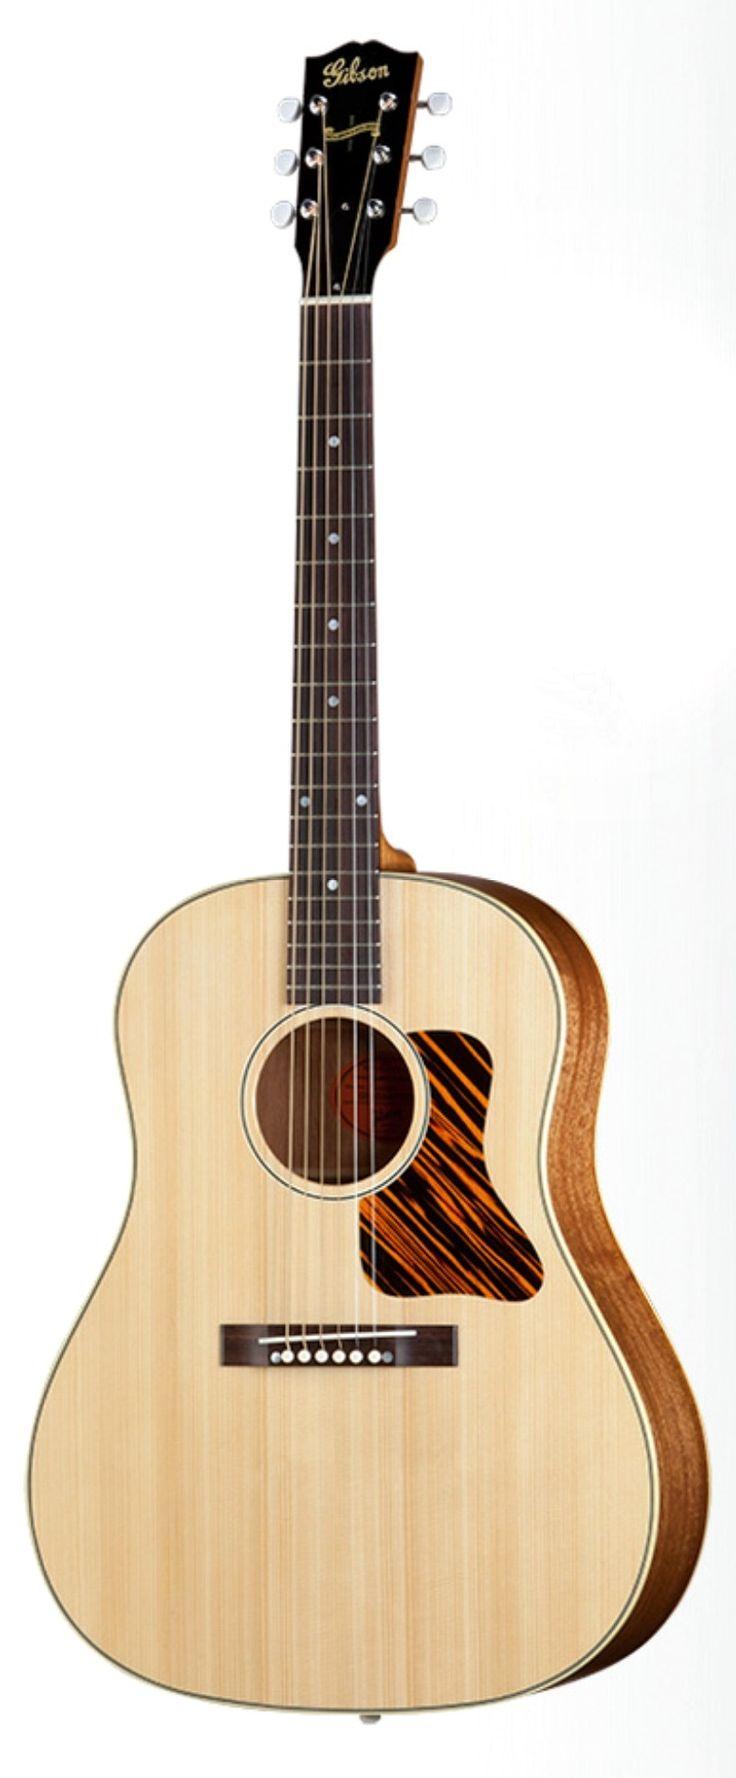 Gibson J-35 (via Gibson Acoustic Guitars)